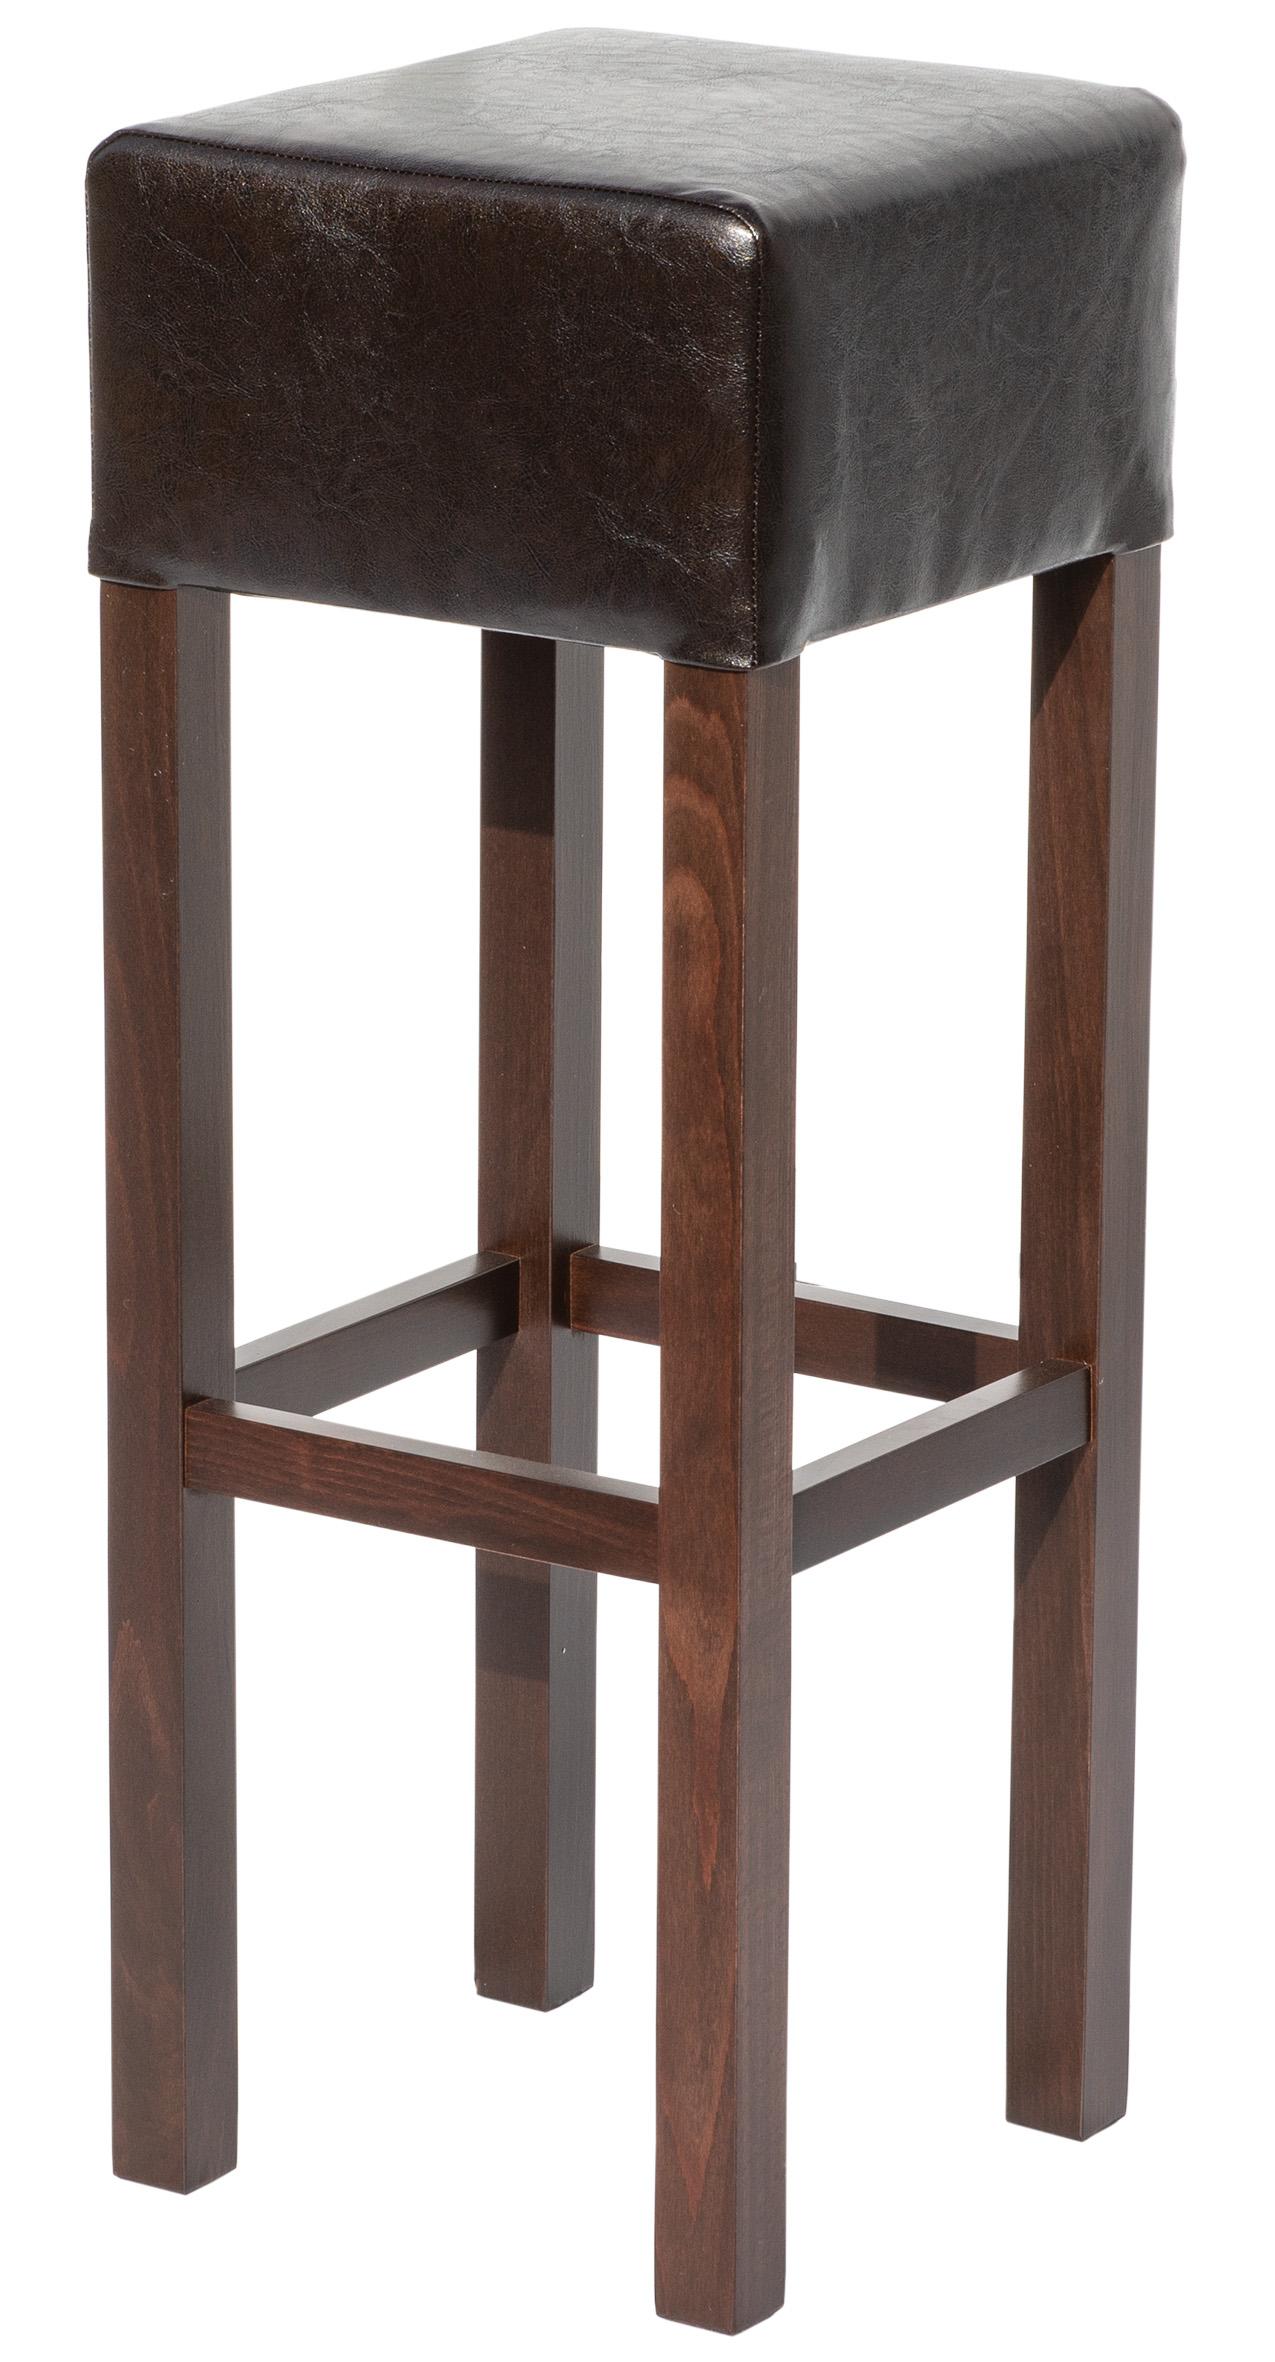 Barhocker Bristol (Tresenhocker, Massivholz, Buche, dunkelbraun / braun / antik-braun, Kunstleder, Nussbaum - rustikal elegant - Barstühle & Tresenhocker)